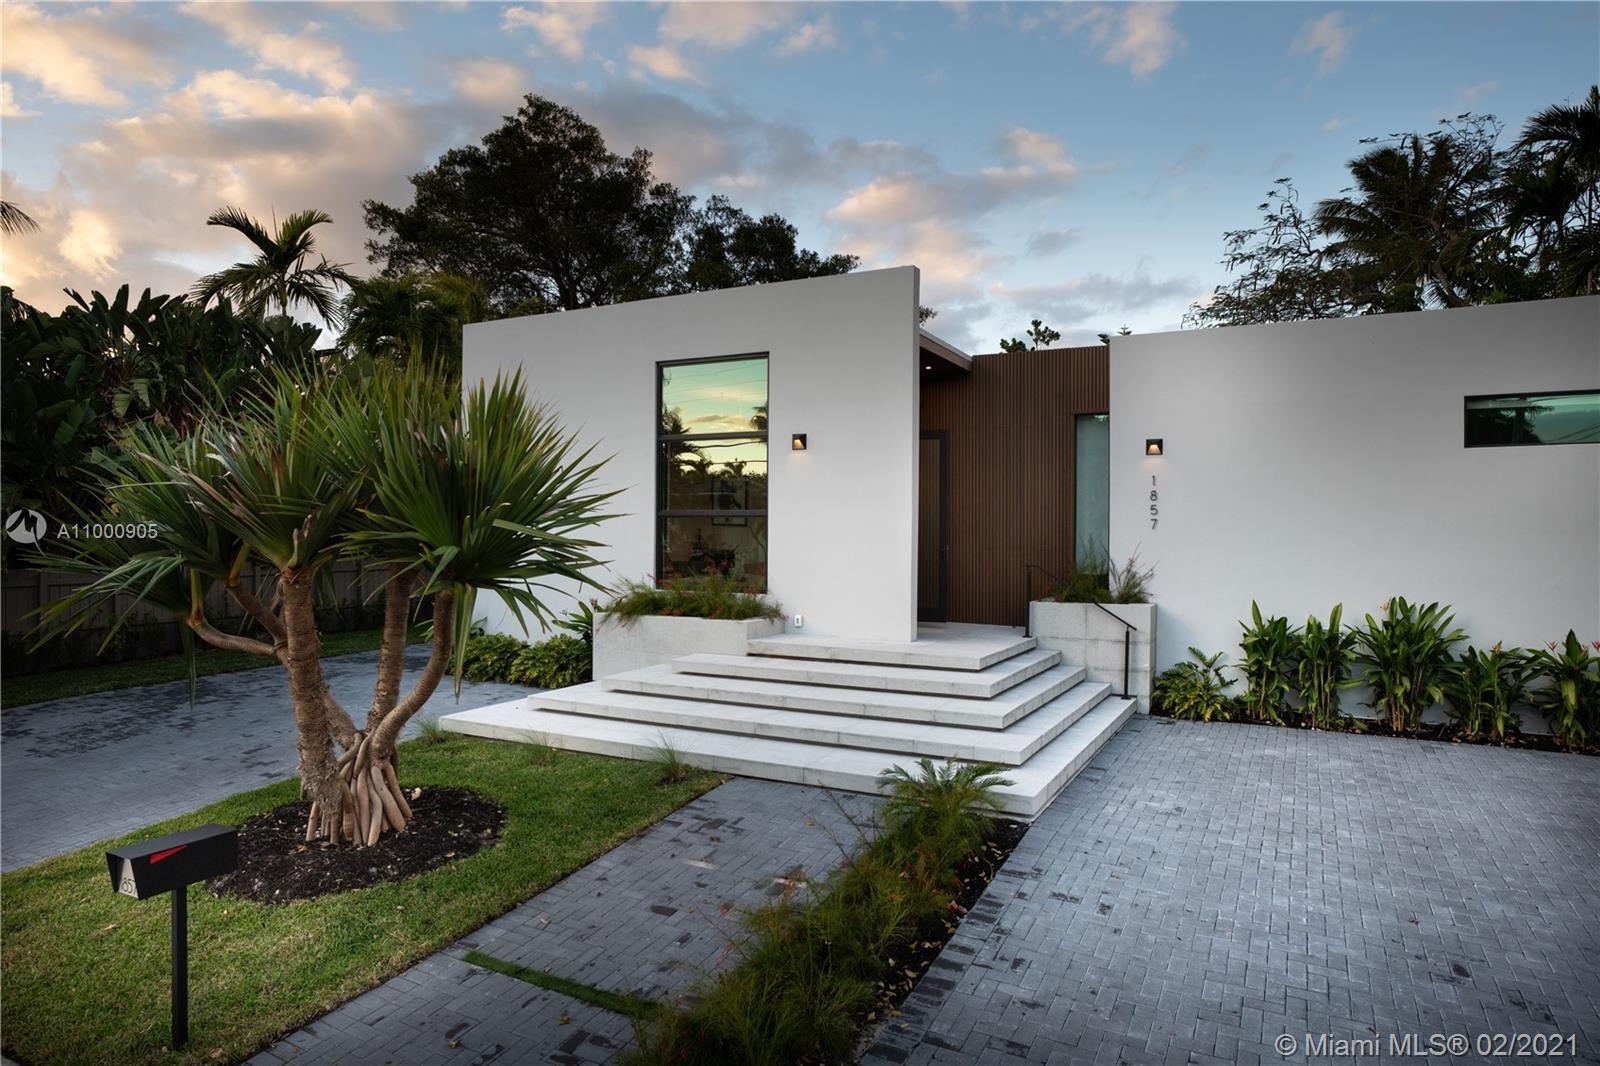 Photo of 1857 NE 124 street, North Miami, FL 33181 (MLS # A11000905)